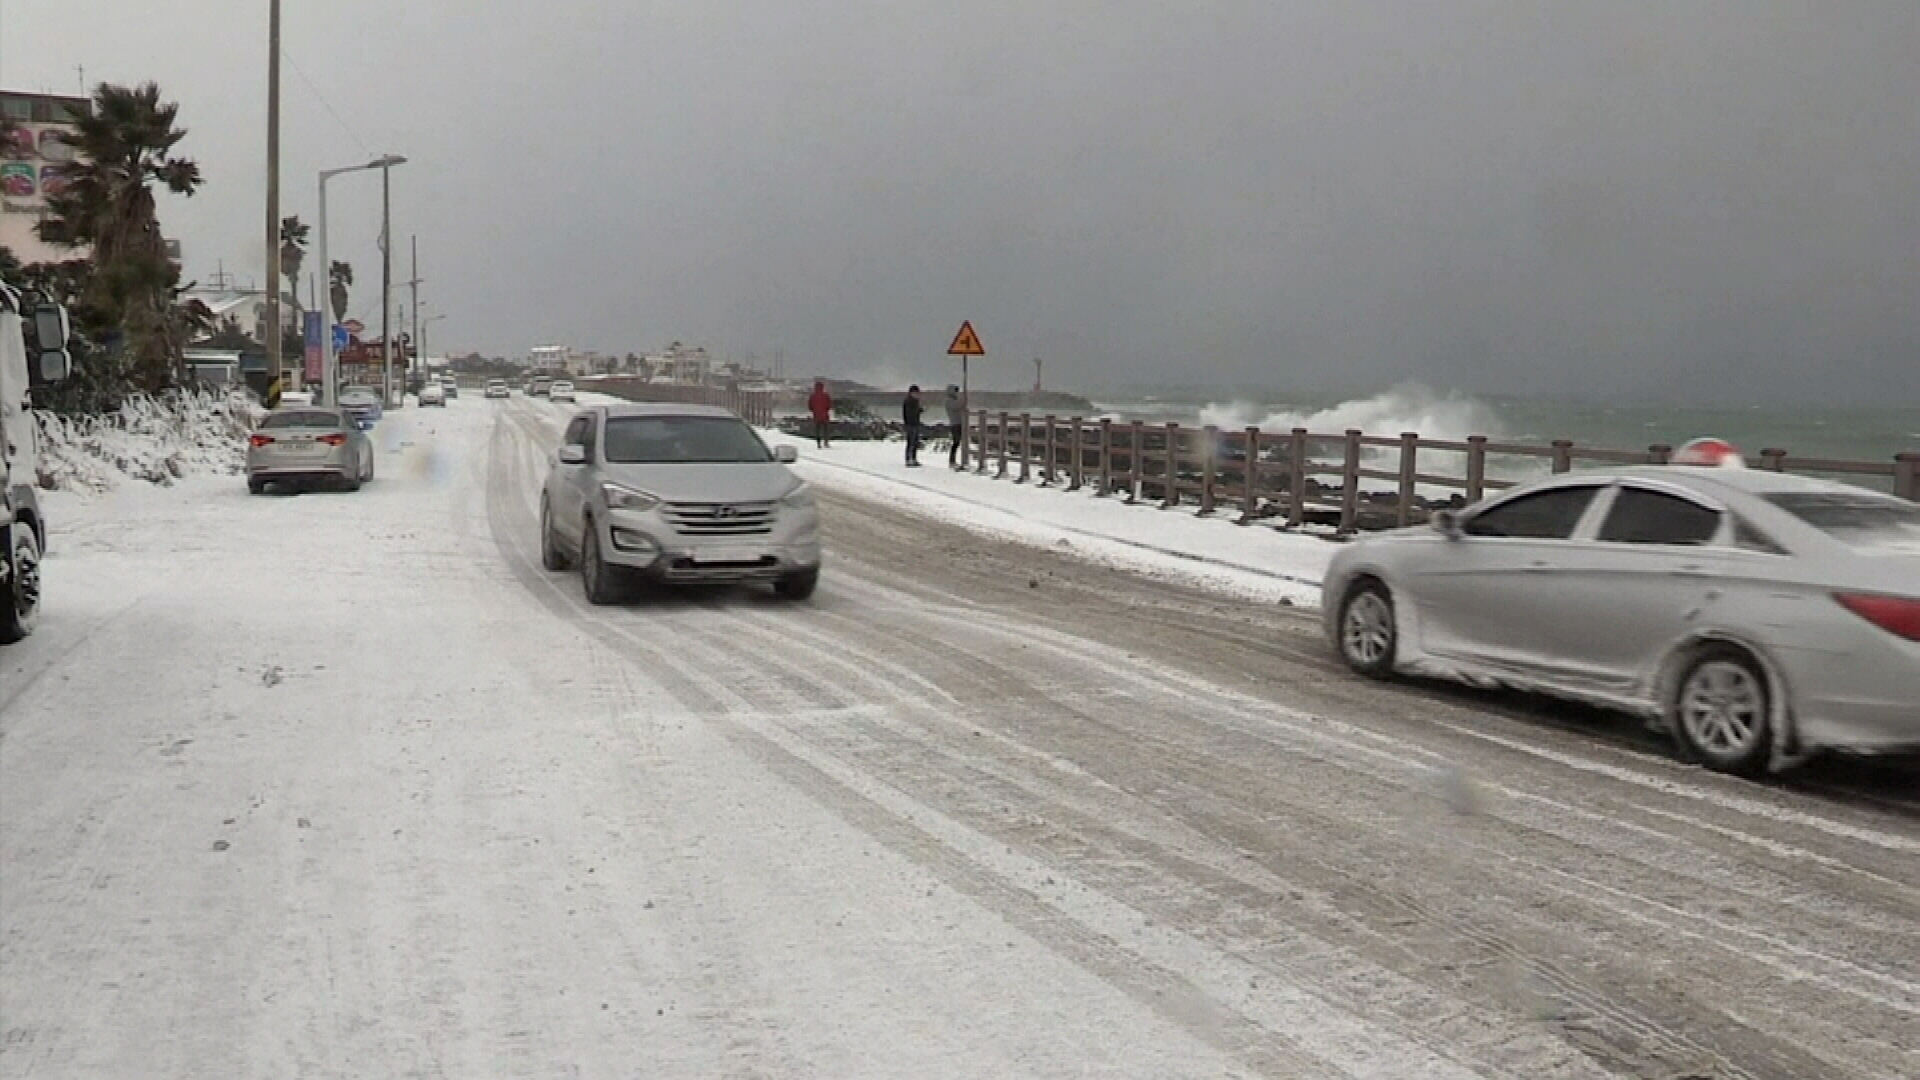 Heavy snow hit the Korean island of Jeju